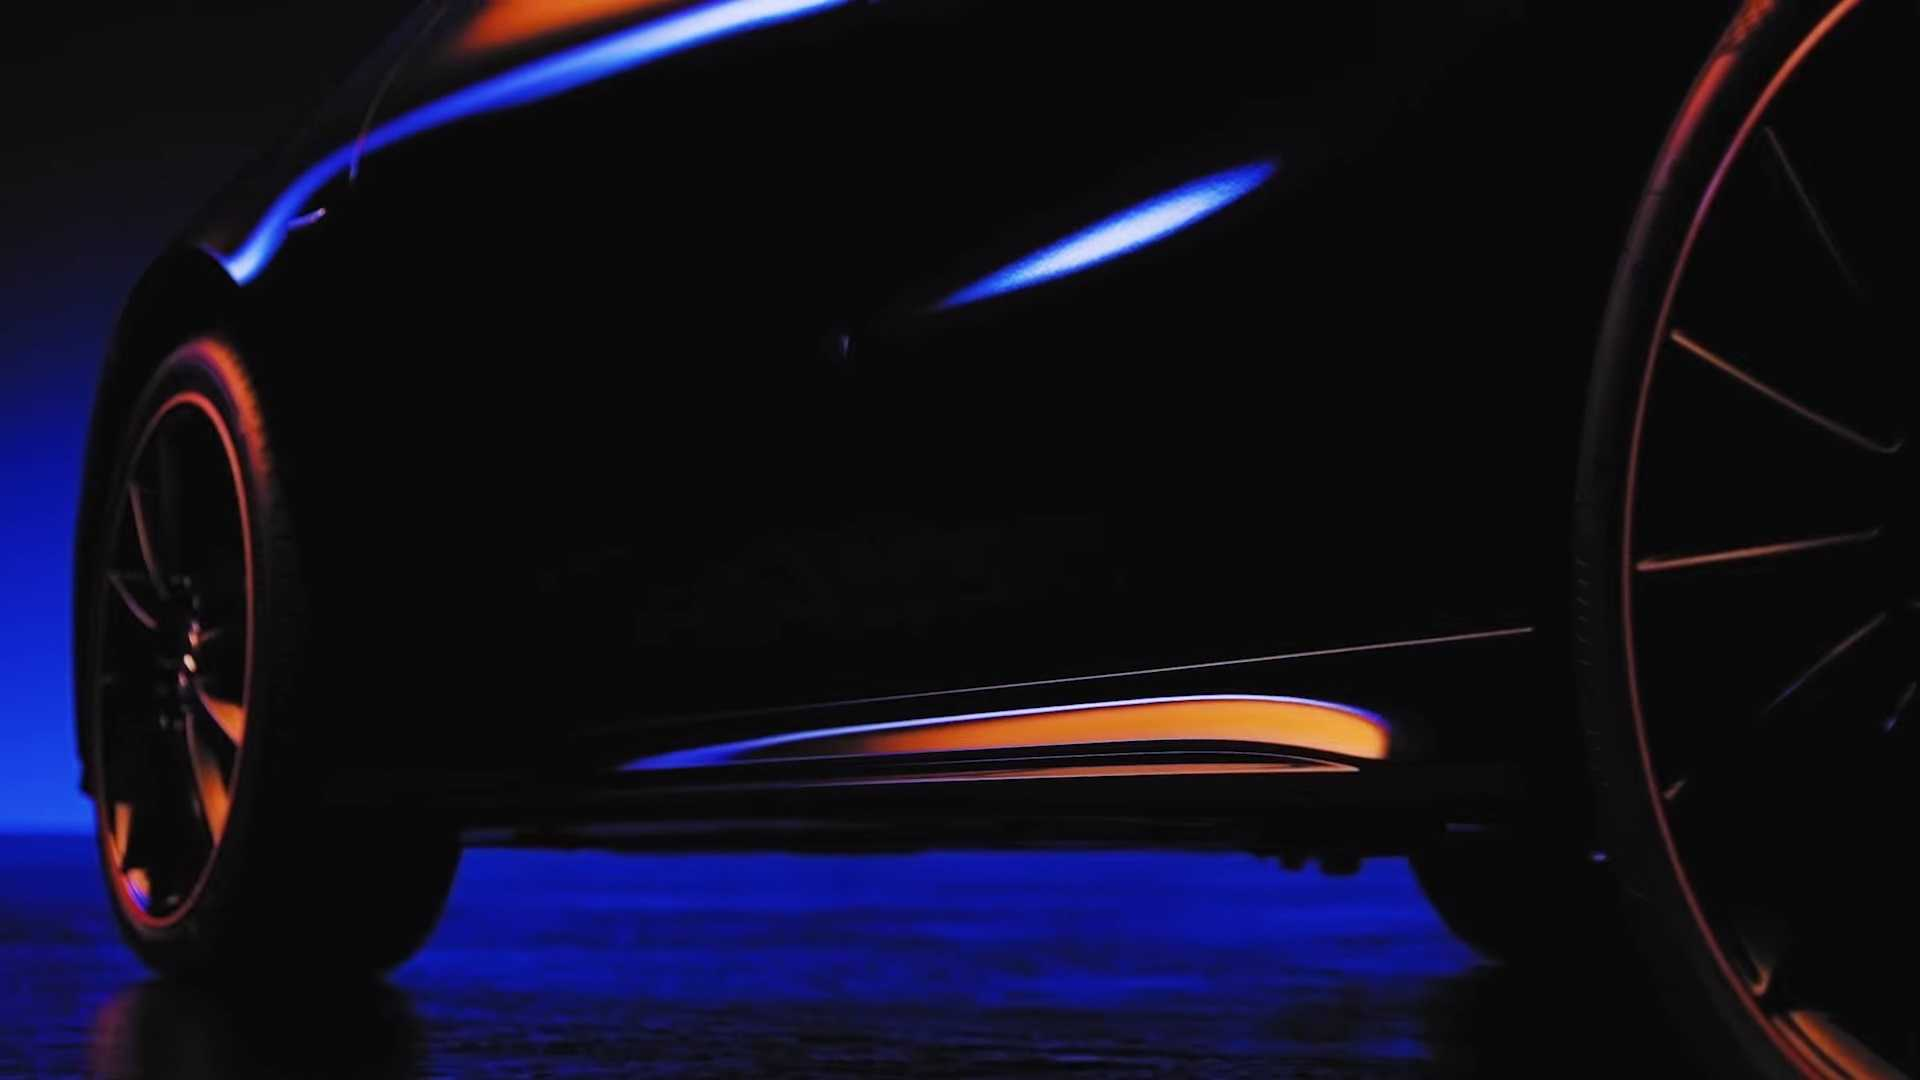 Mercedes CLA 2019 teasers (8)